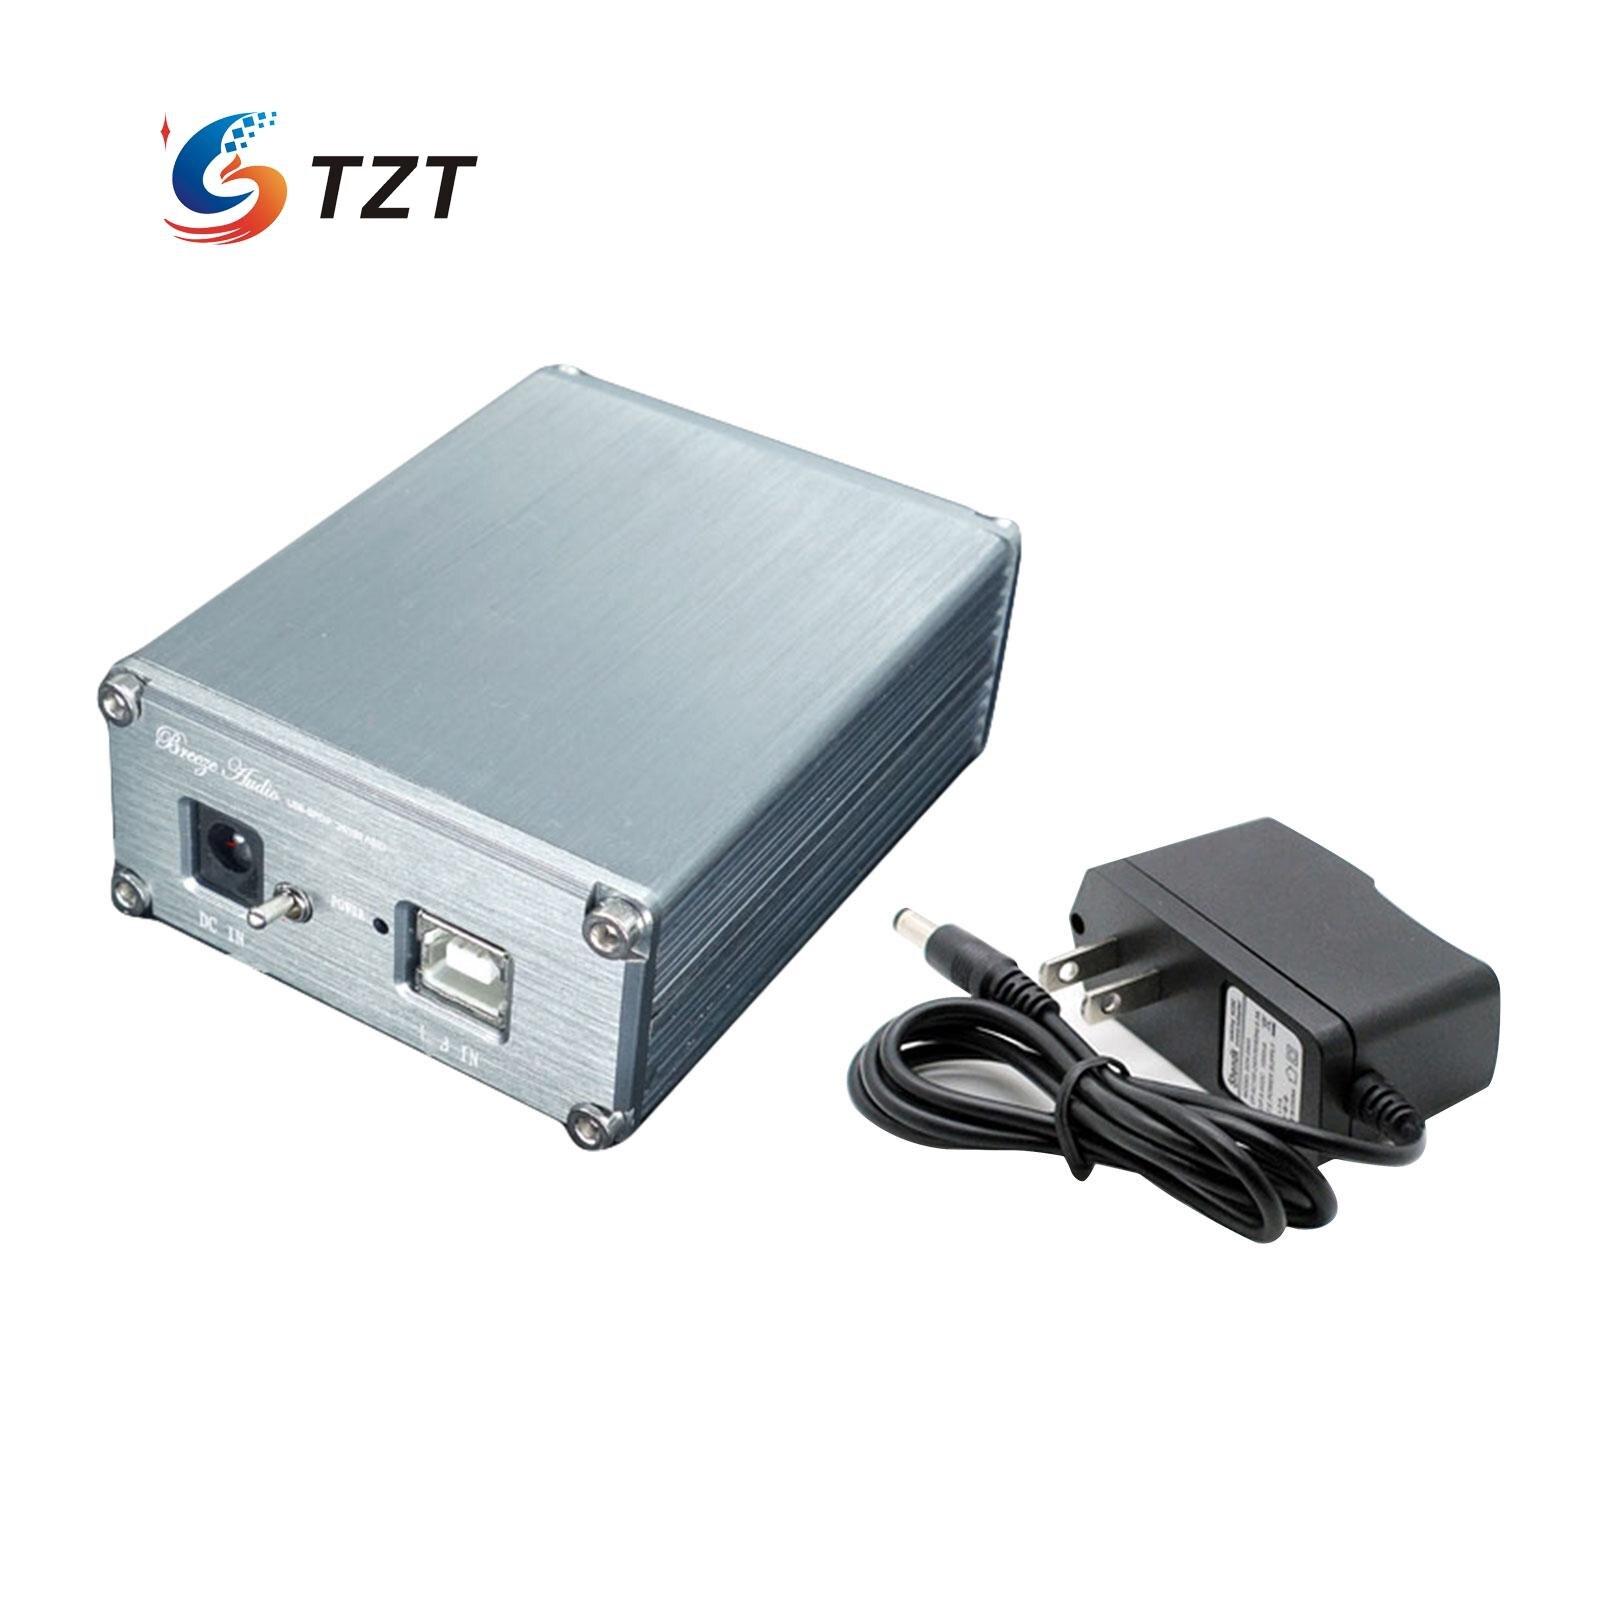 ФОТО SU0 XMOS U8 USB DAC+ AK4490 Audio Hifi Top Asynchronous USB Decoder Headphone Amplifier with Power Adapter